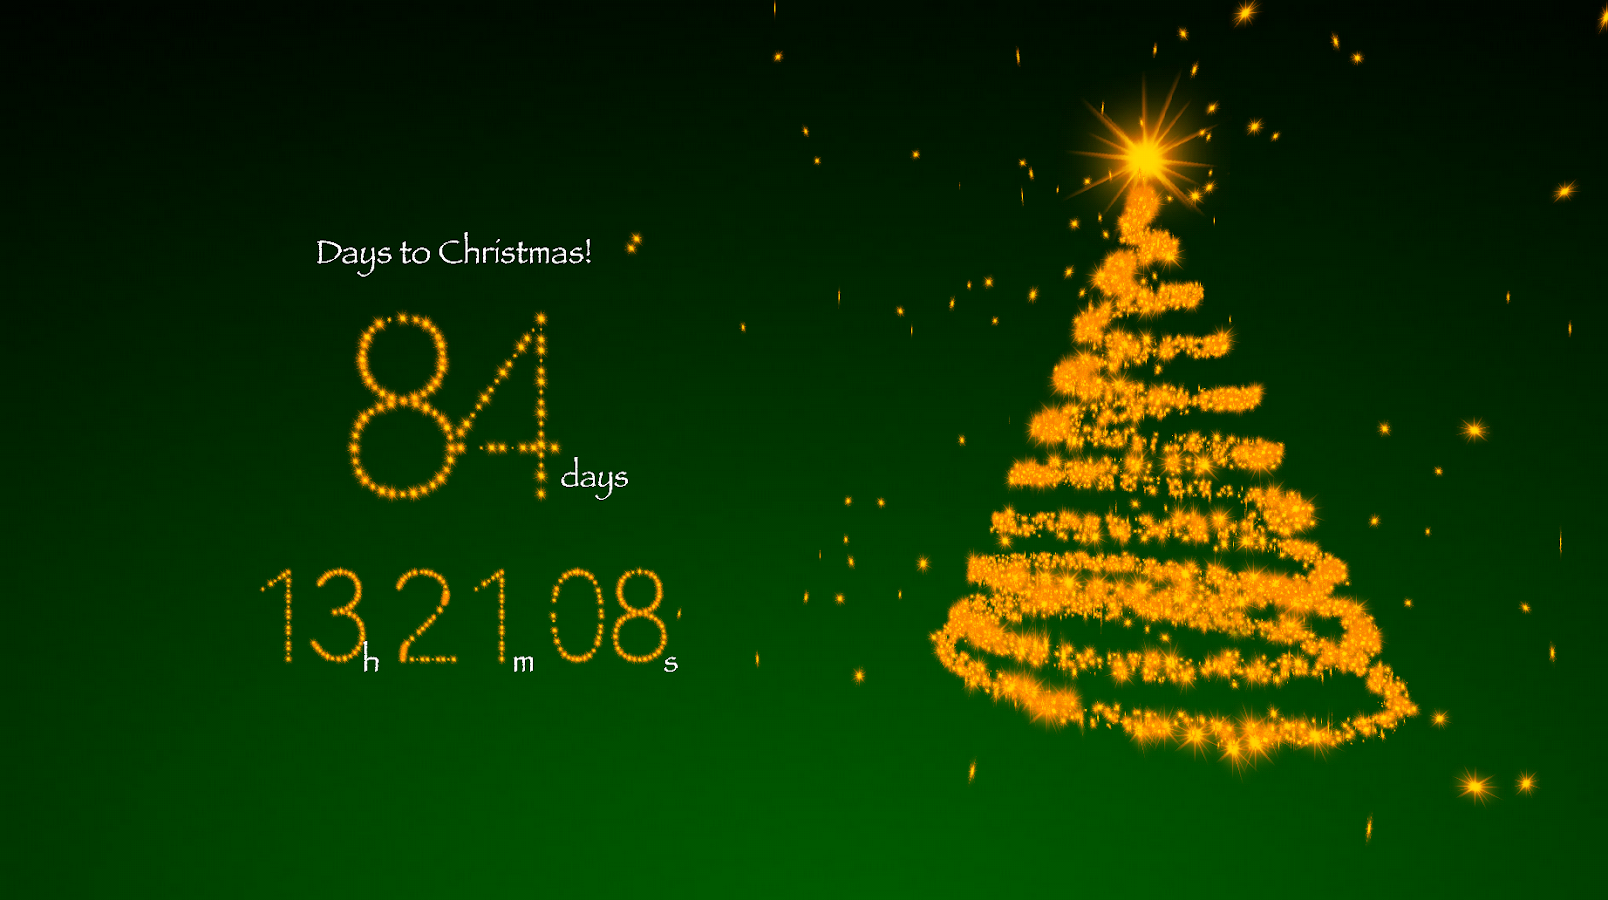 Live Christmas Countdown Screensaver | newhairstylesformen2014.com